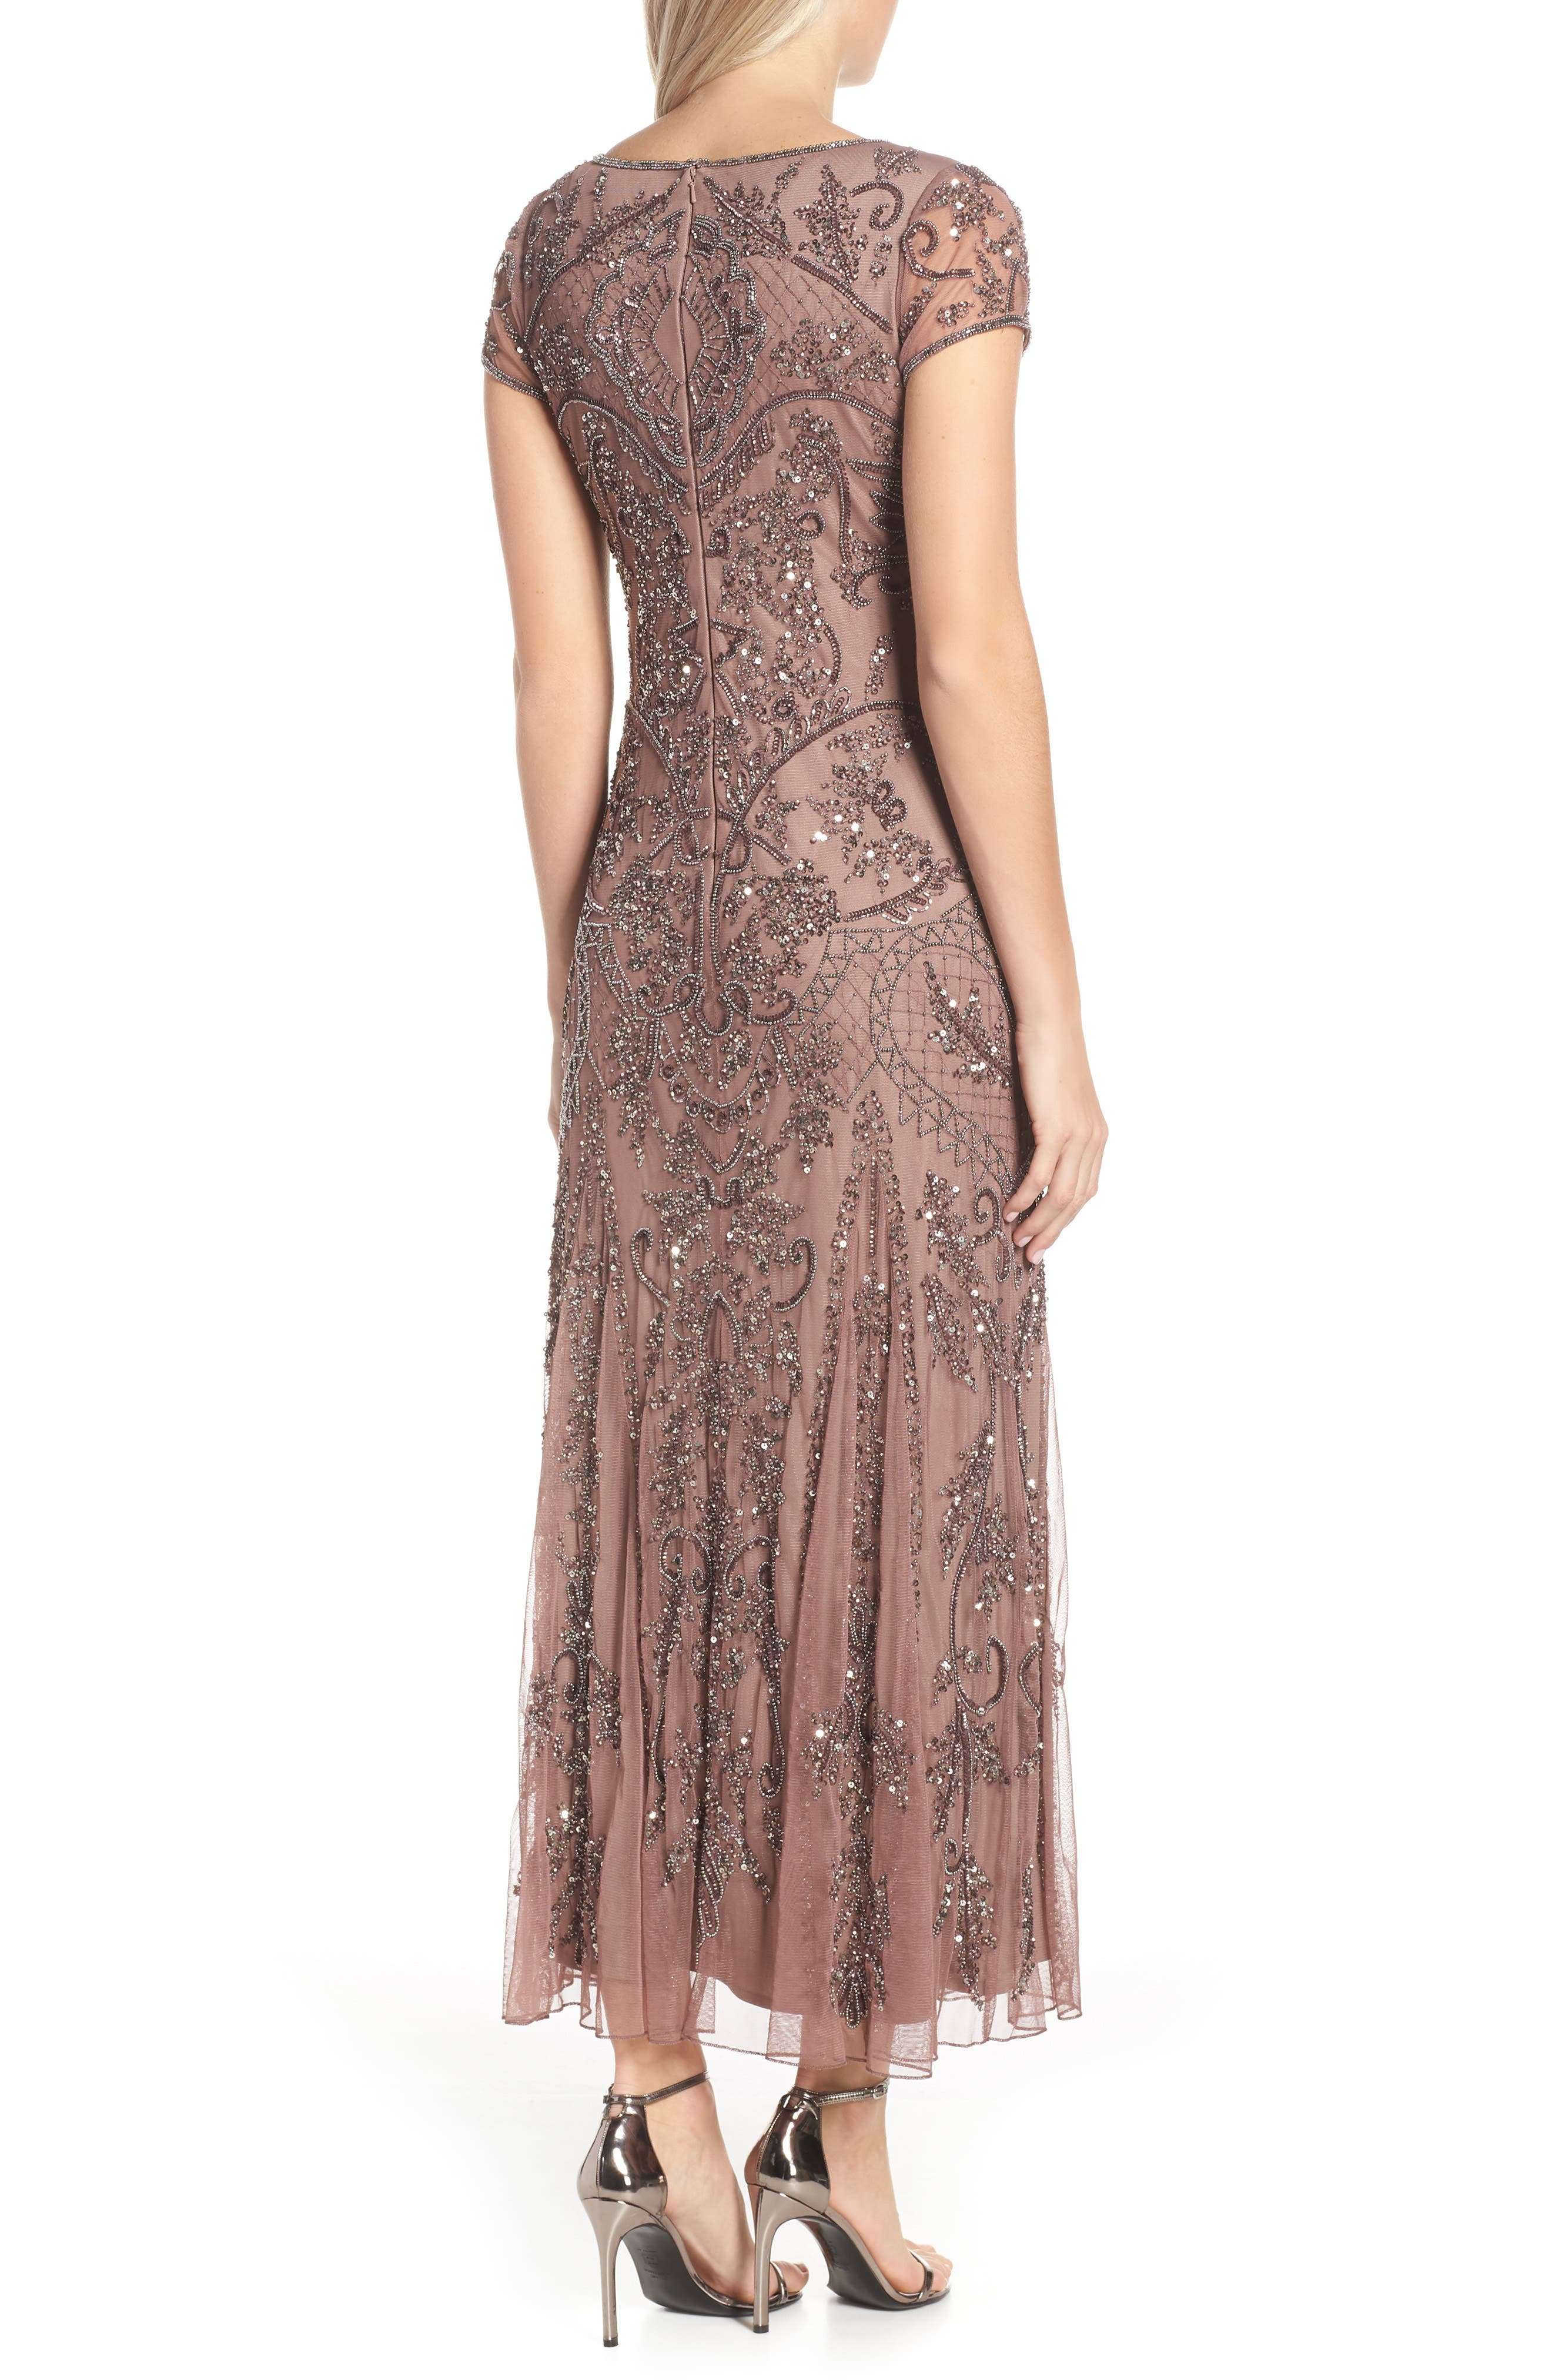 2cc333079 Women's Wedding Guest Dresses | Nordstrom